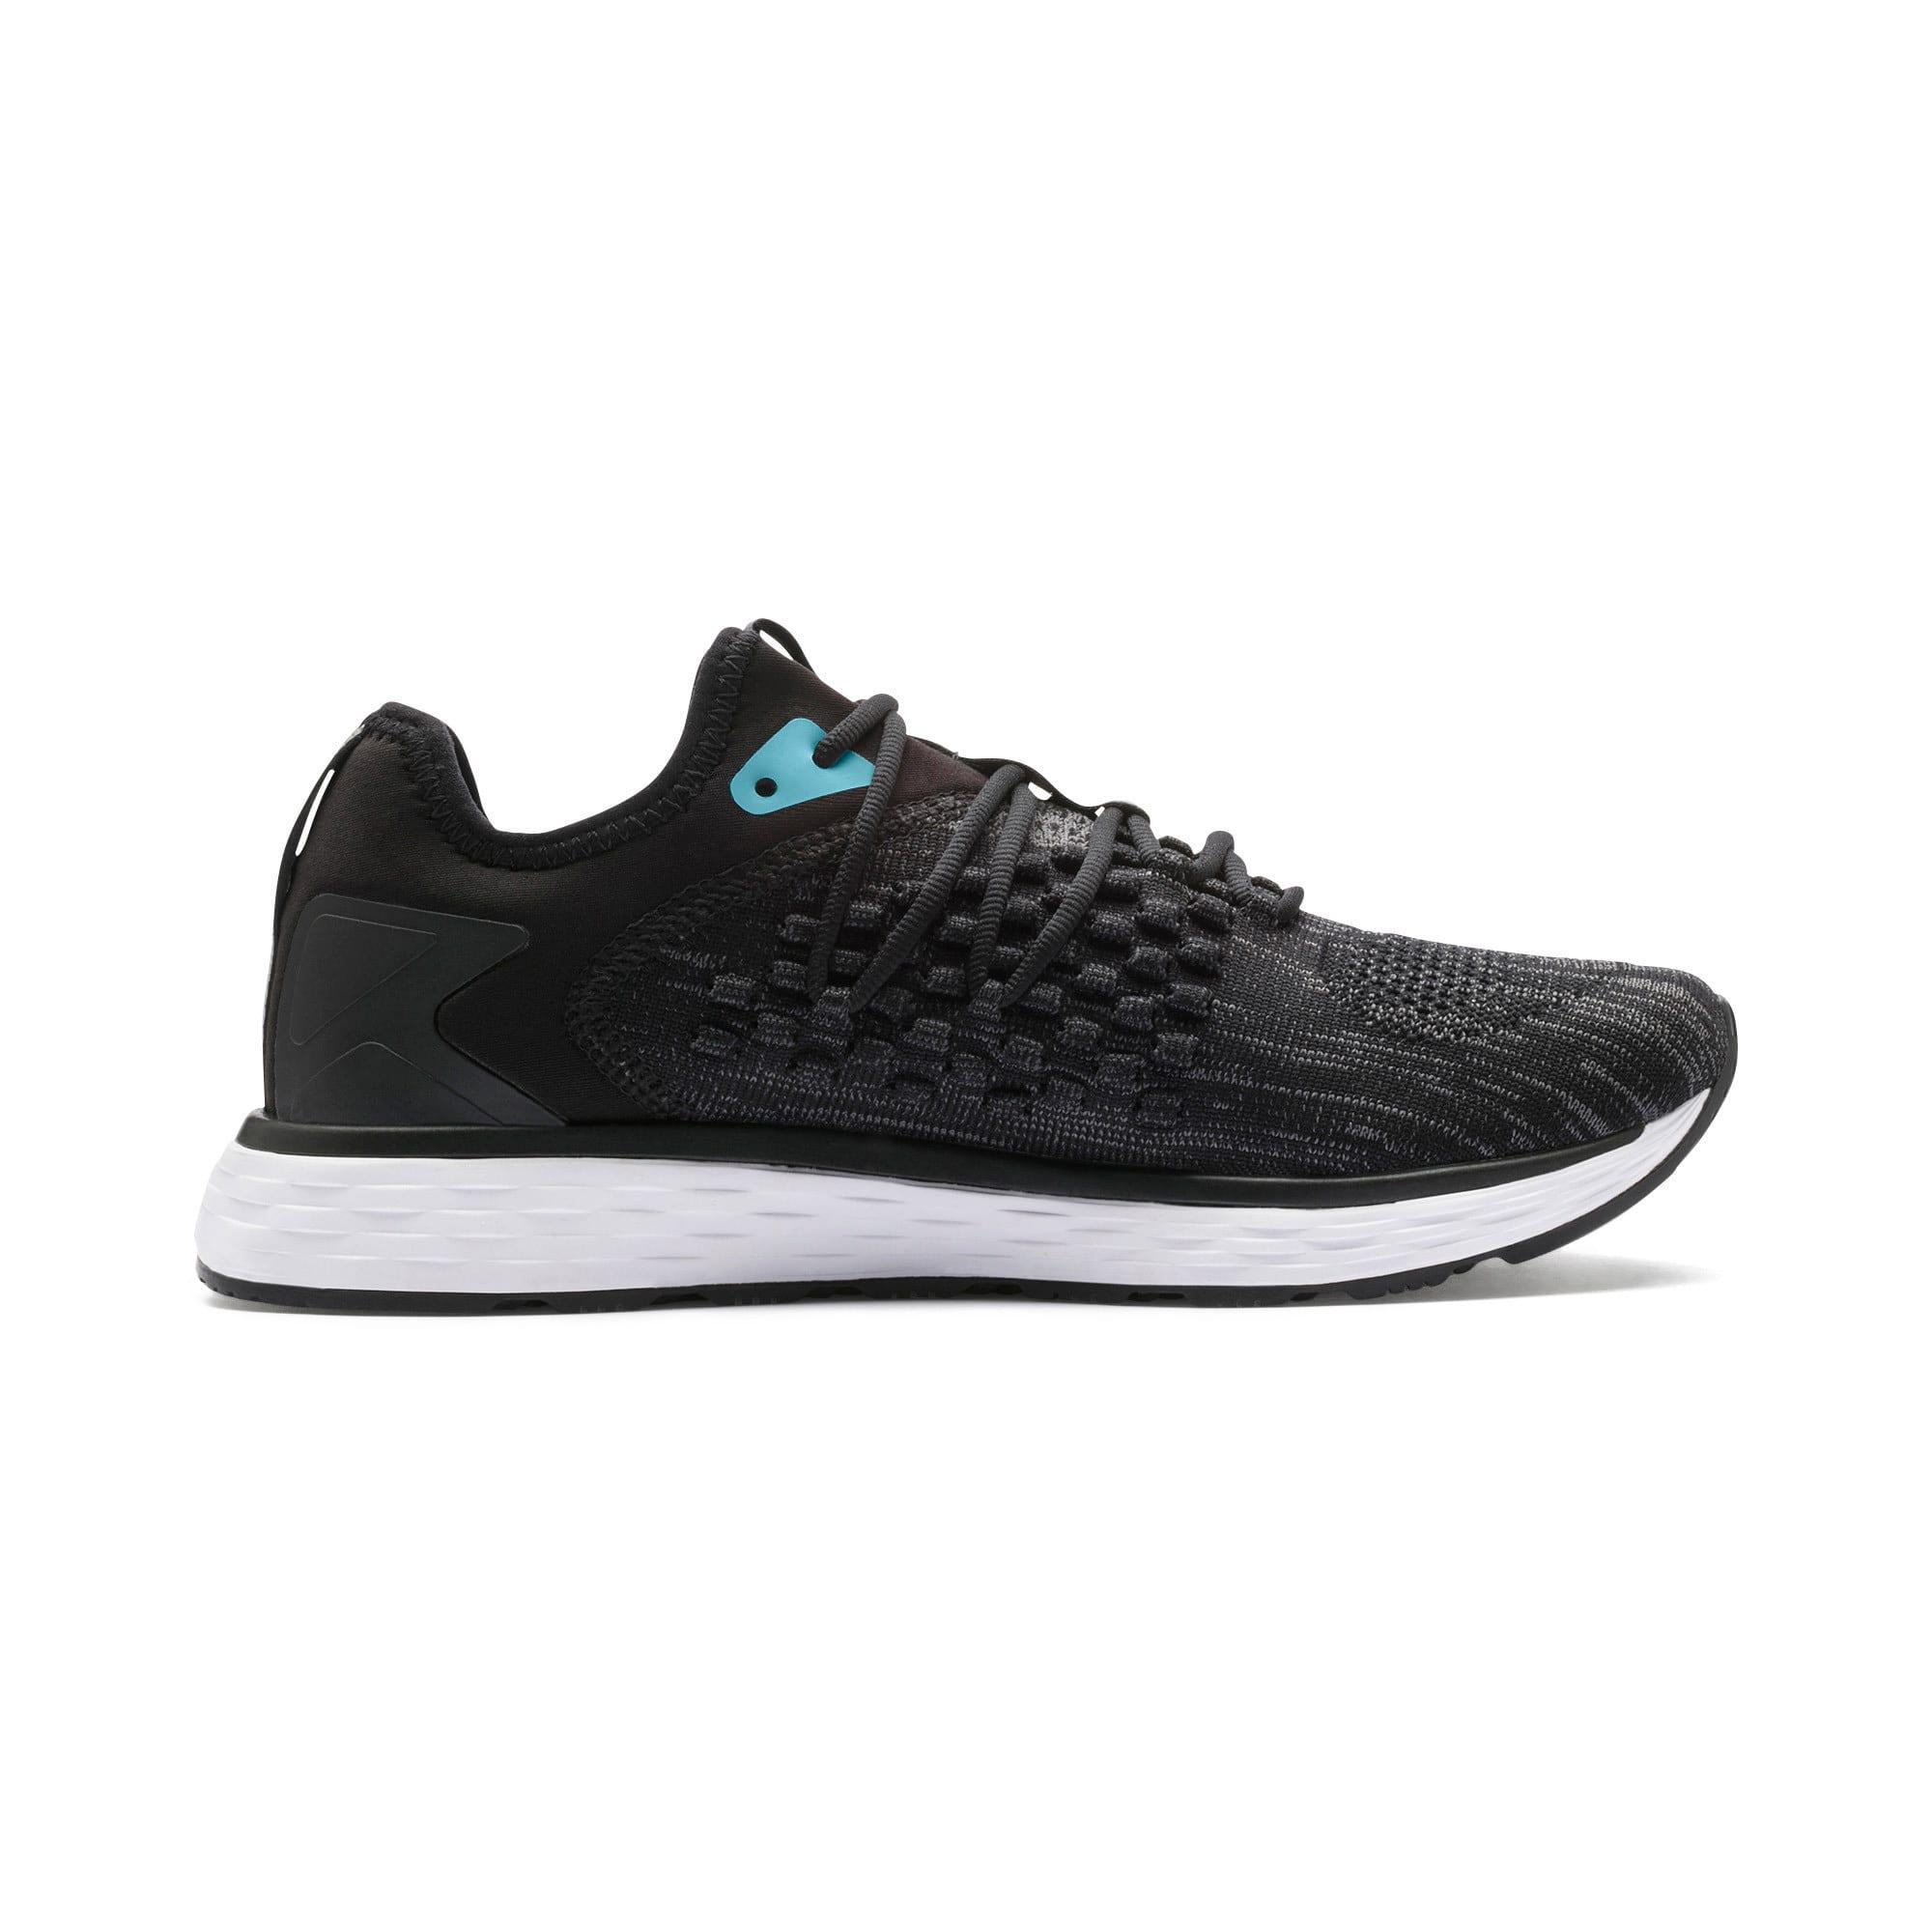 Thumbnail 7 of SPEED FUSEFIT Women's Running Shoes, Puma Black-Milky Blue, medium-IND